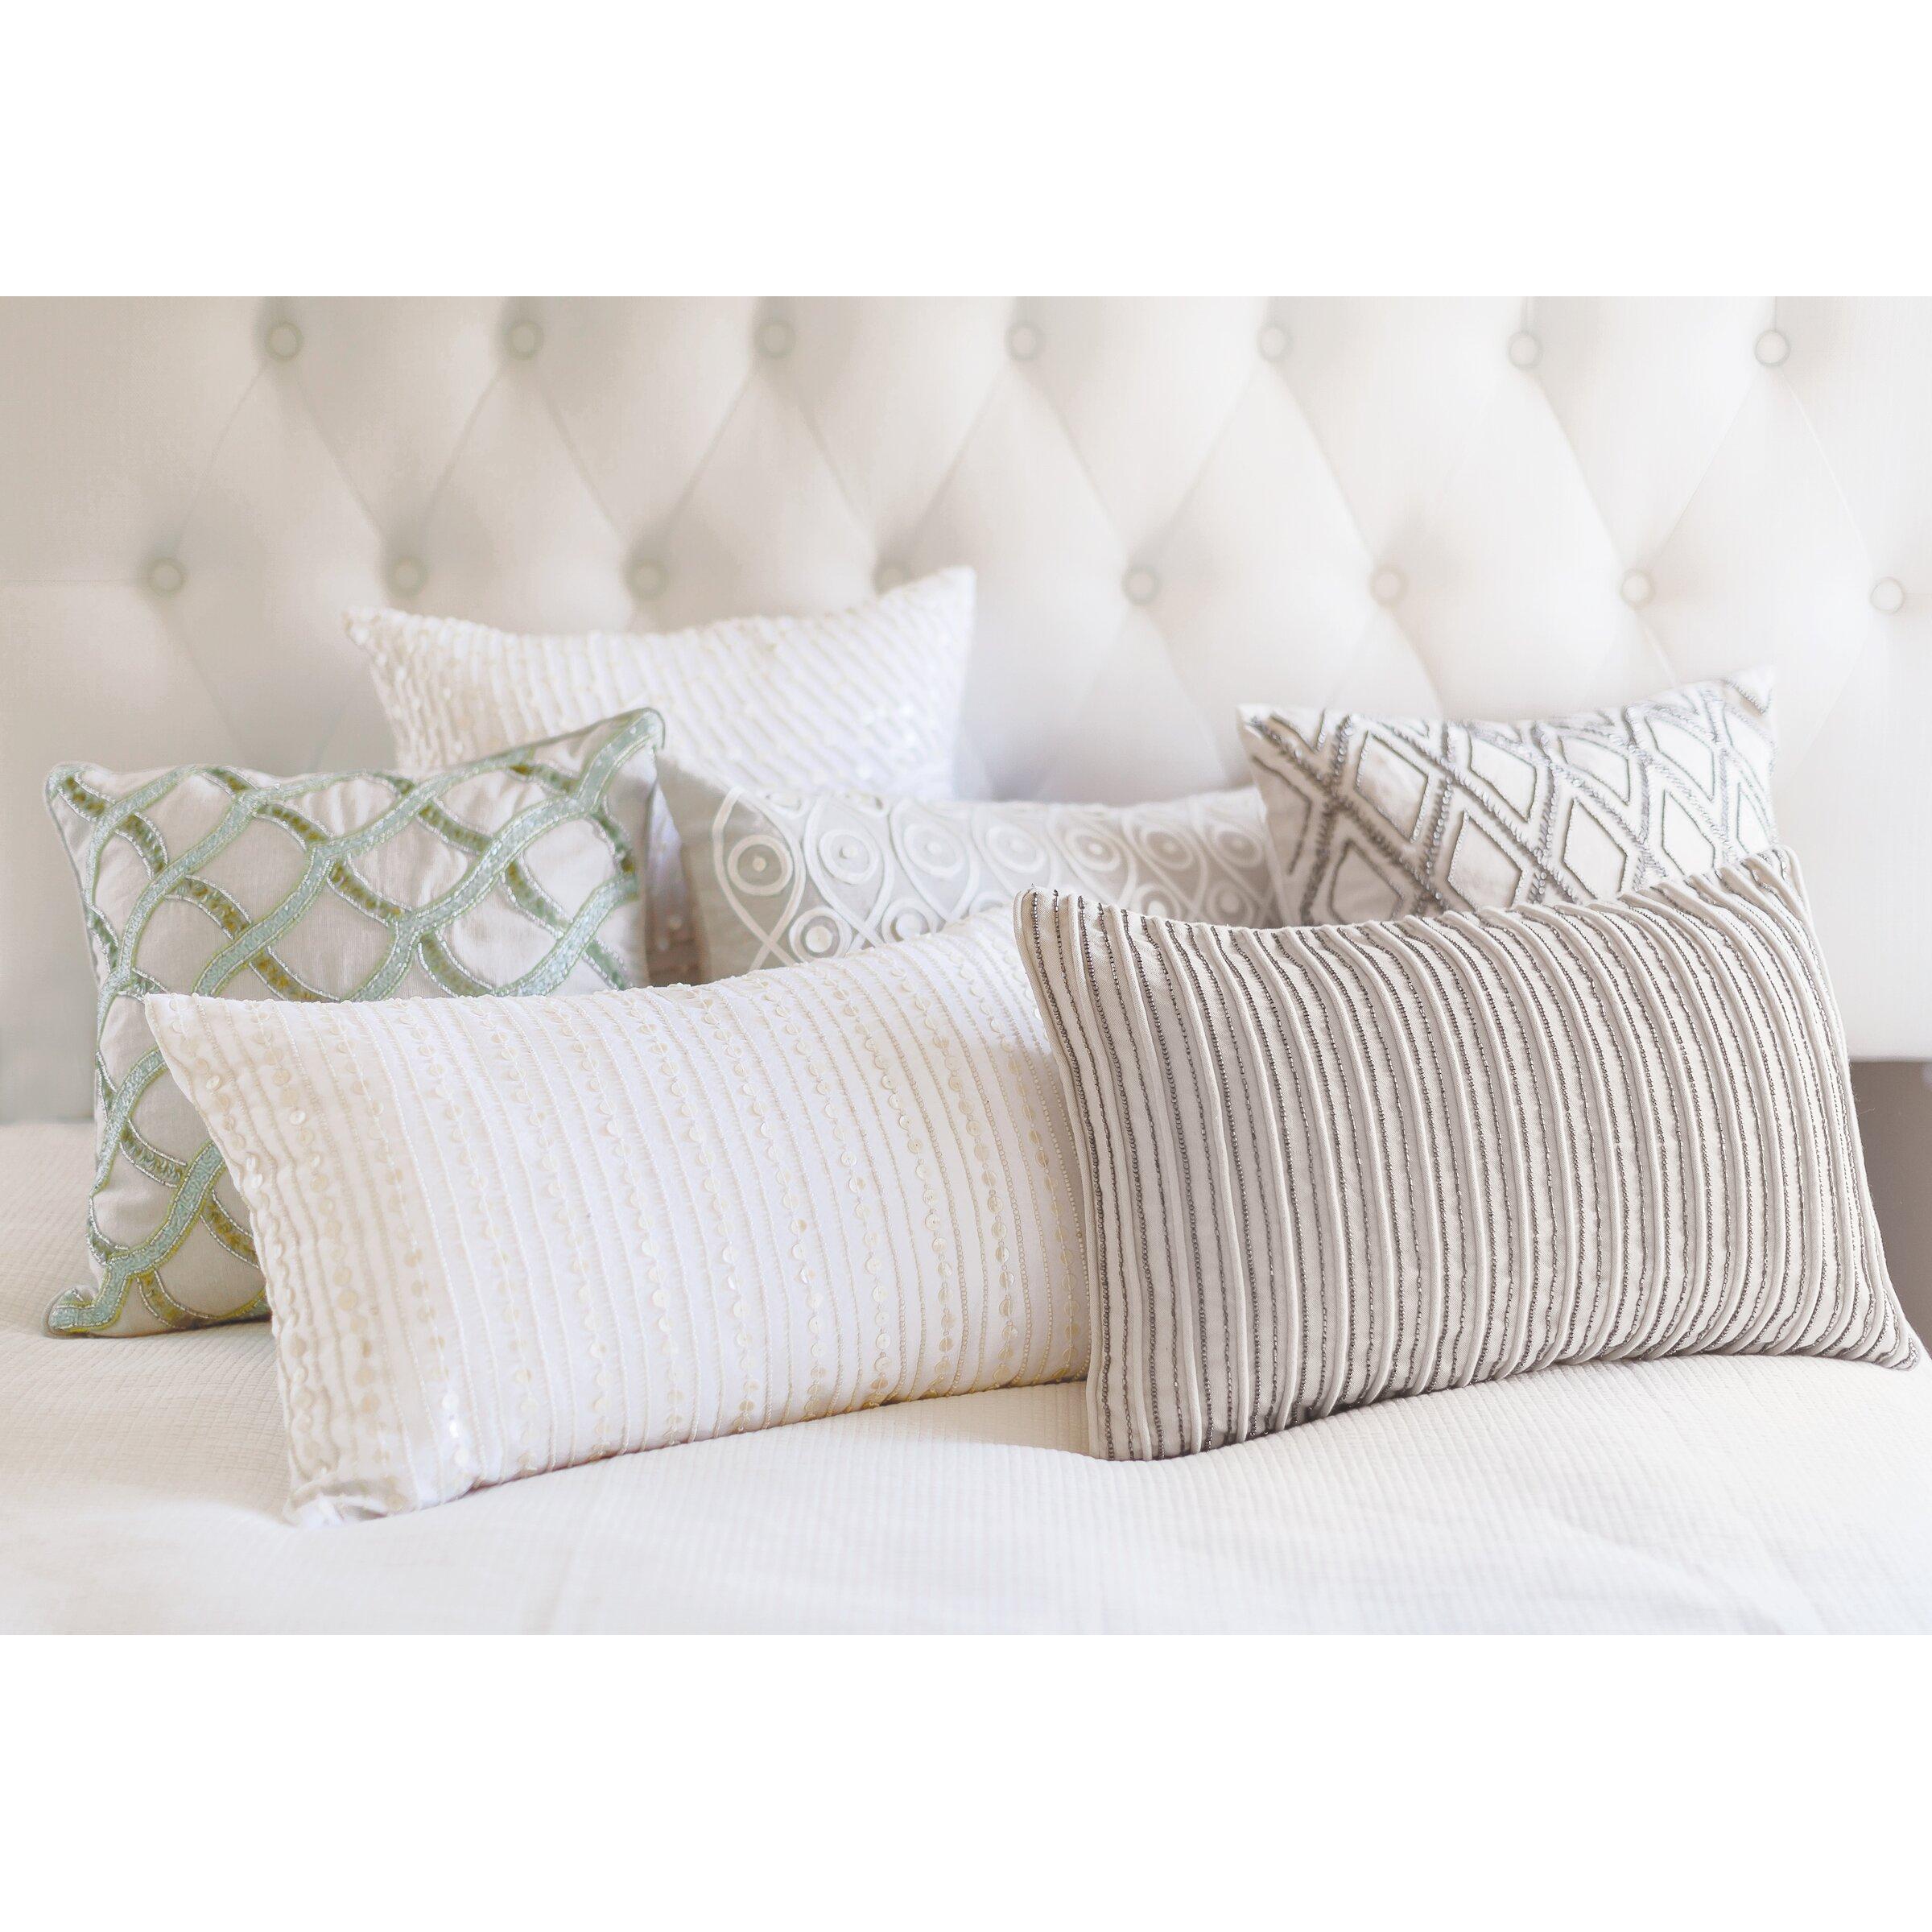 Elisabeth York Sea Glass Ripple Cotton Throw Pillow